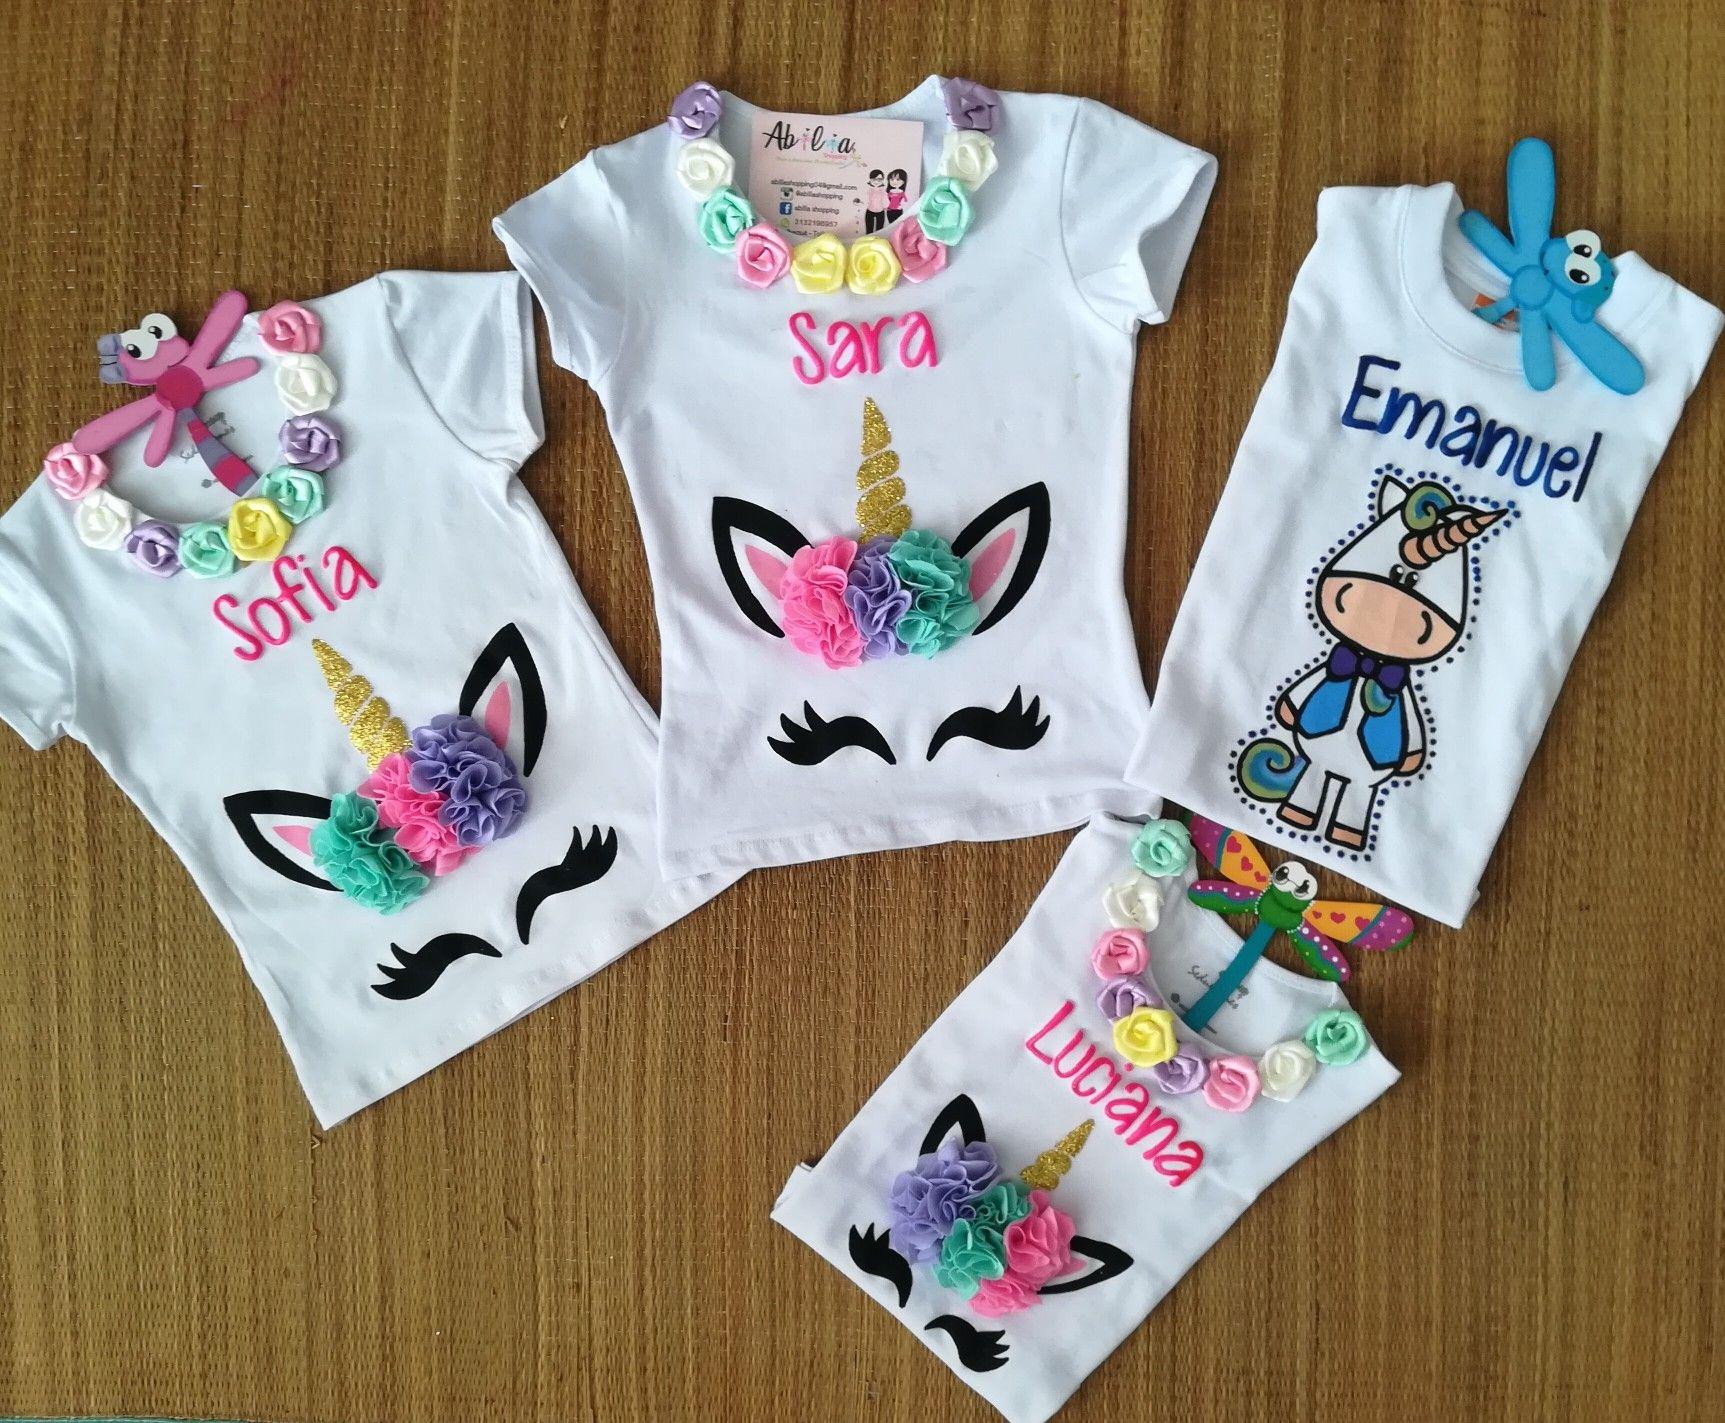 813c89bdeb Blusas y camisetas unicornio Abilia Shopping Whatsapp 3132196957 Mujer  hombre niña